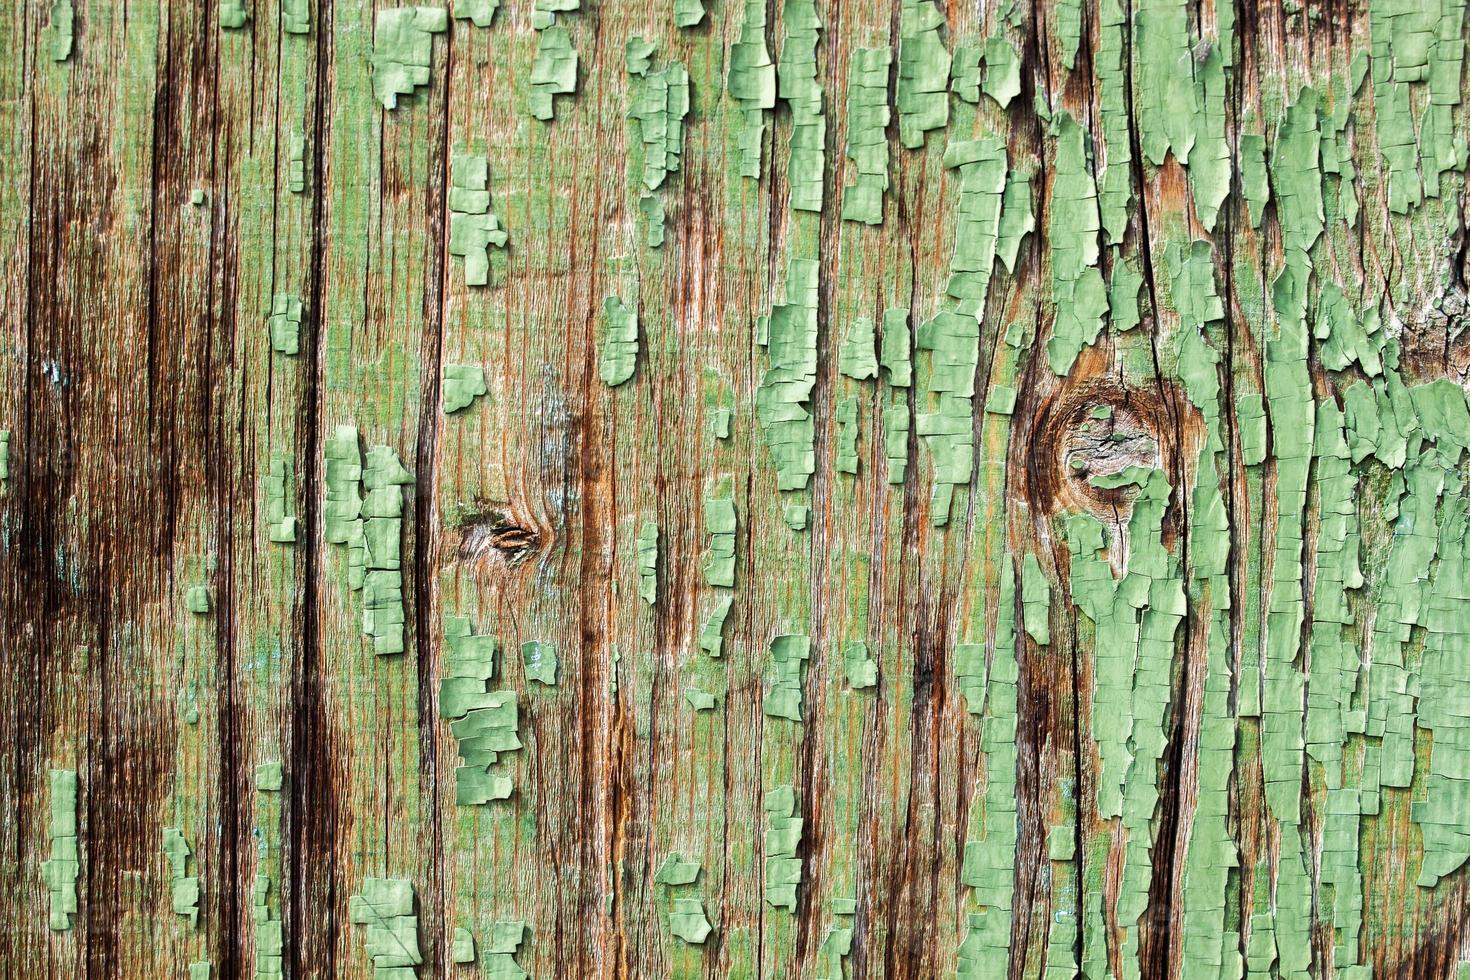 Antigua puerta de madera con pintura verde agrietada. foto